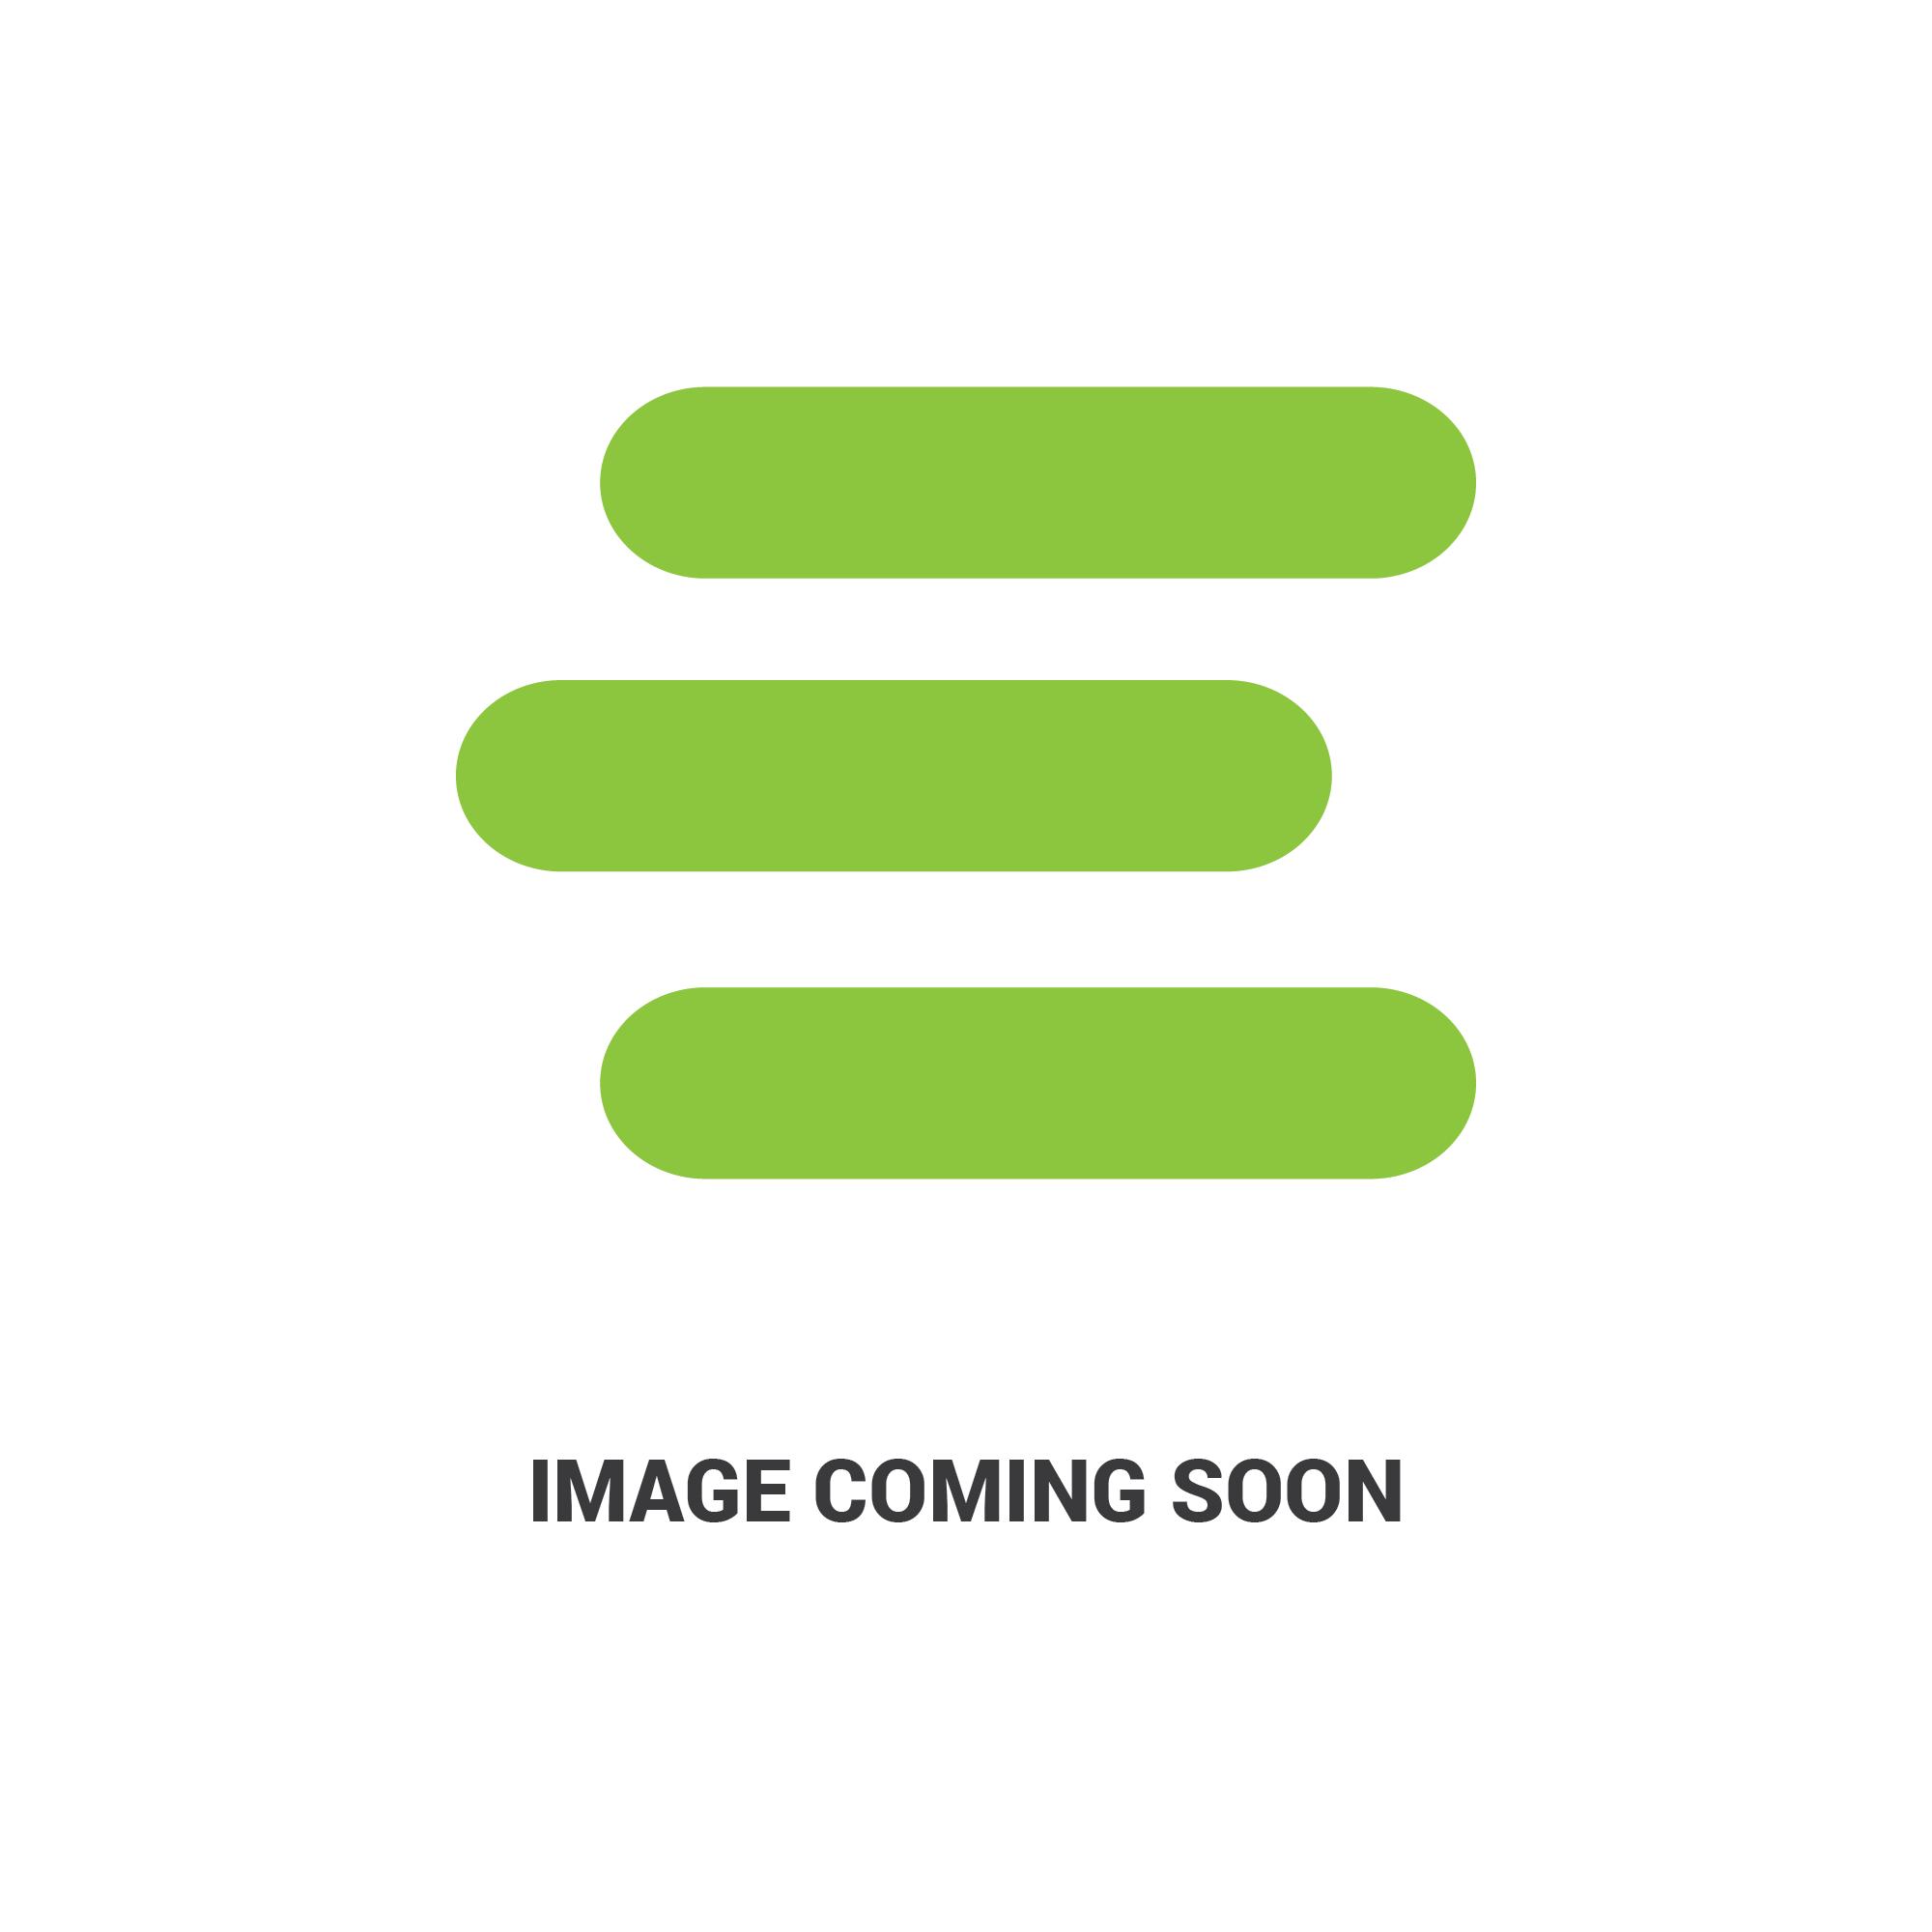 E-36919-528722364_1.jpg